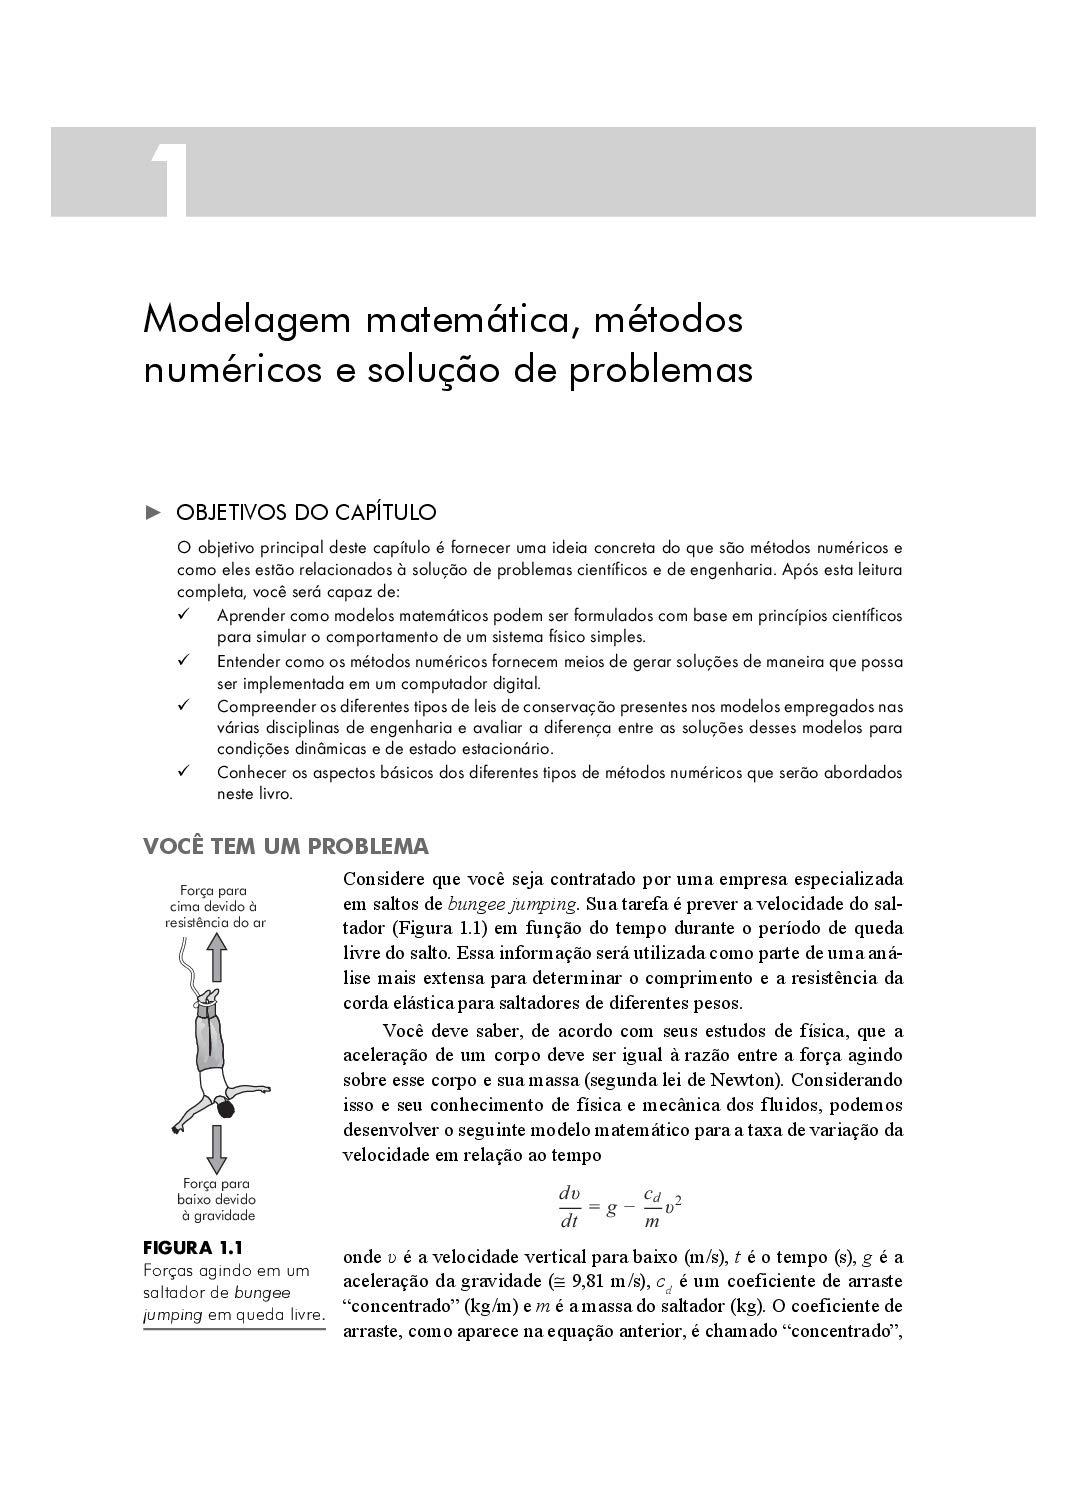 Metodos Numericos Para Engenharia Chapra Pdf